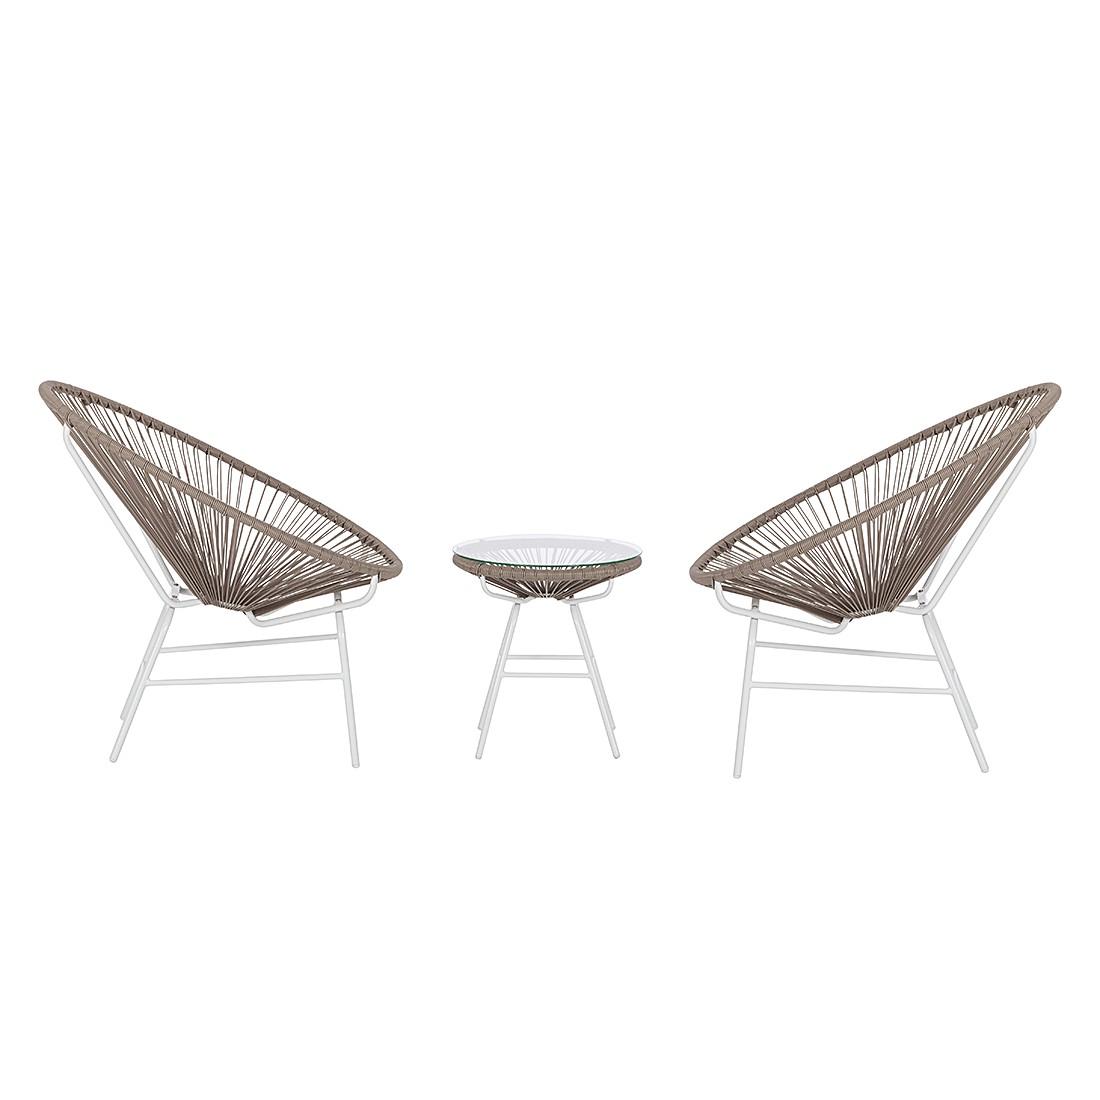 sitzgruppe copacabana ii 3 teilig gartenlounge gartenm bel gartenset ebay. Black Bedroom Furniture Sets. Home Design Ideas